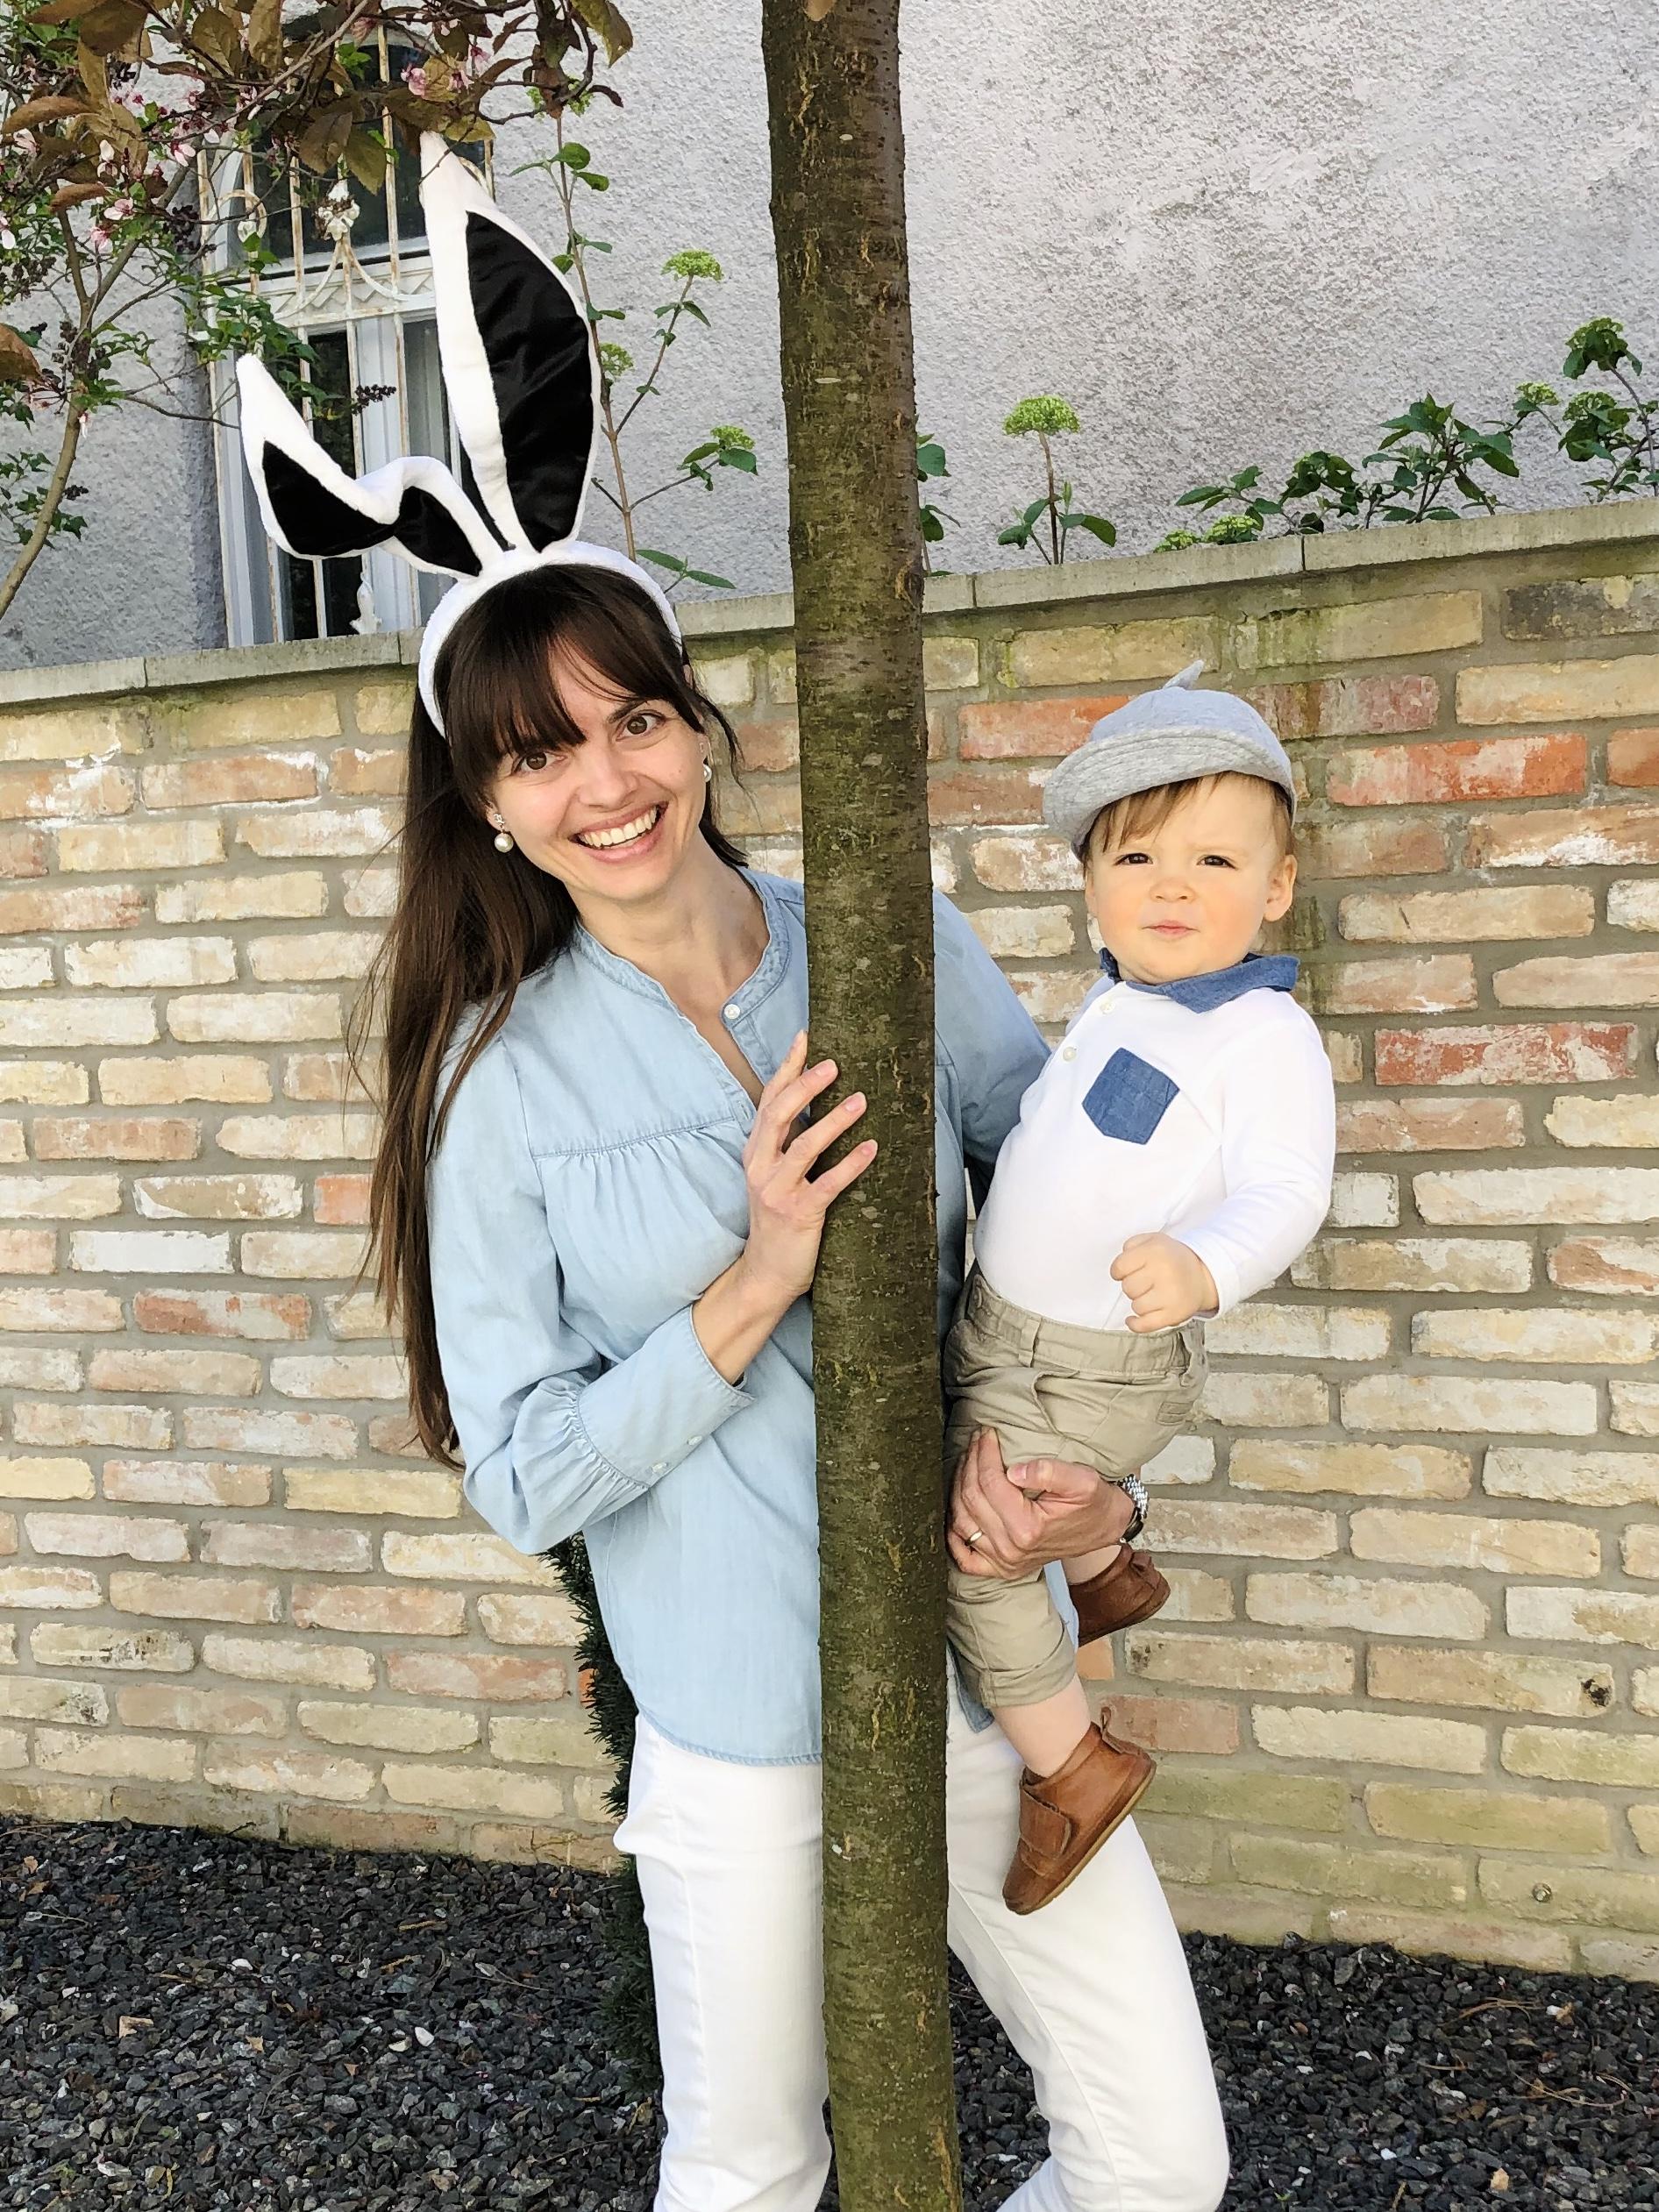 oblecenie vhodne na dojcenie